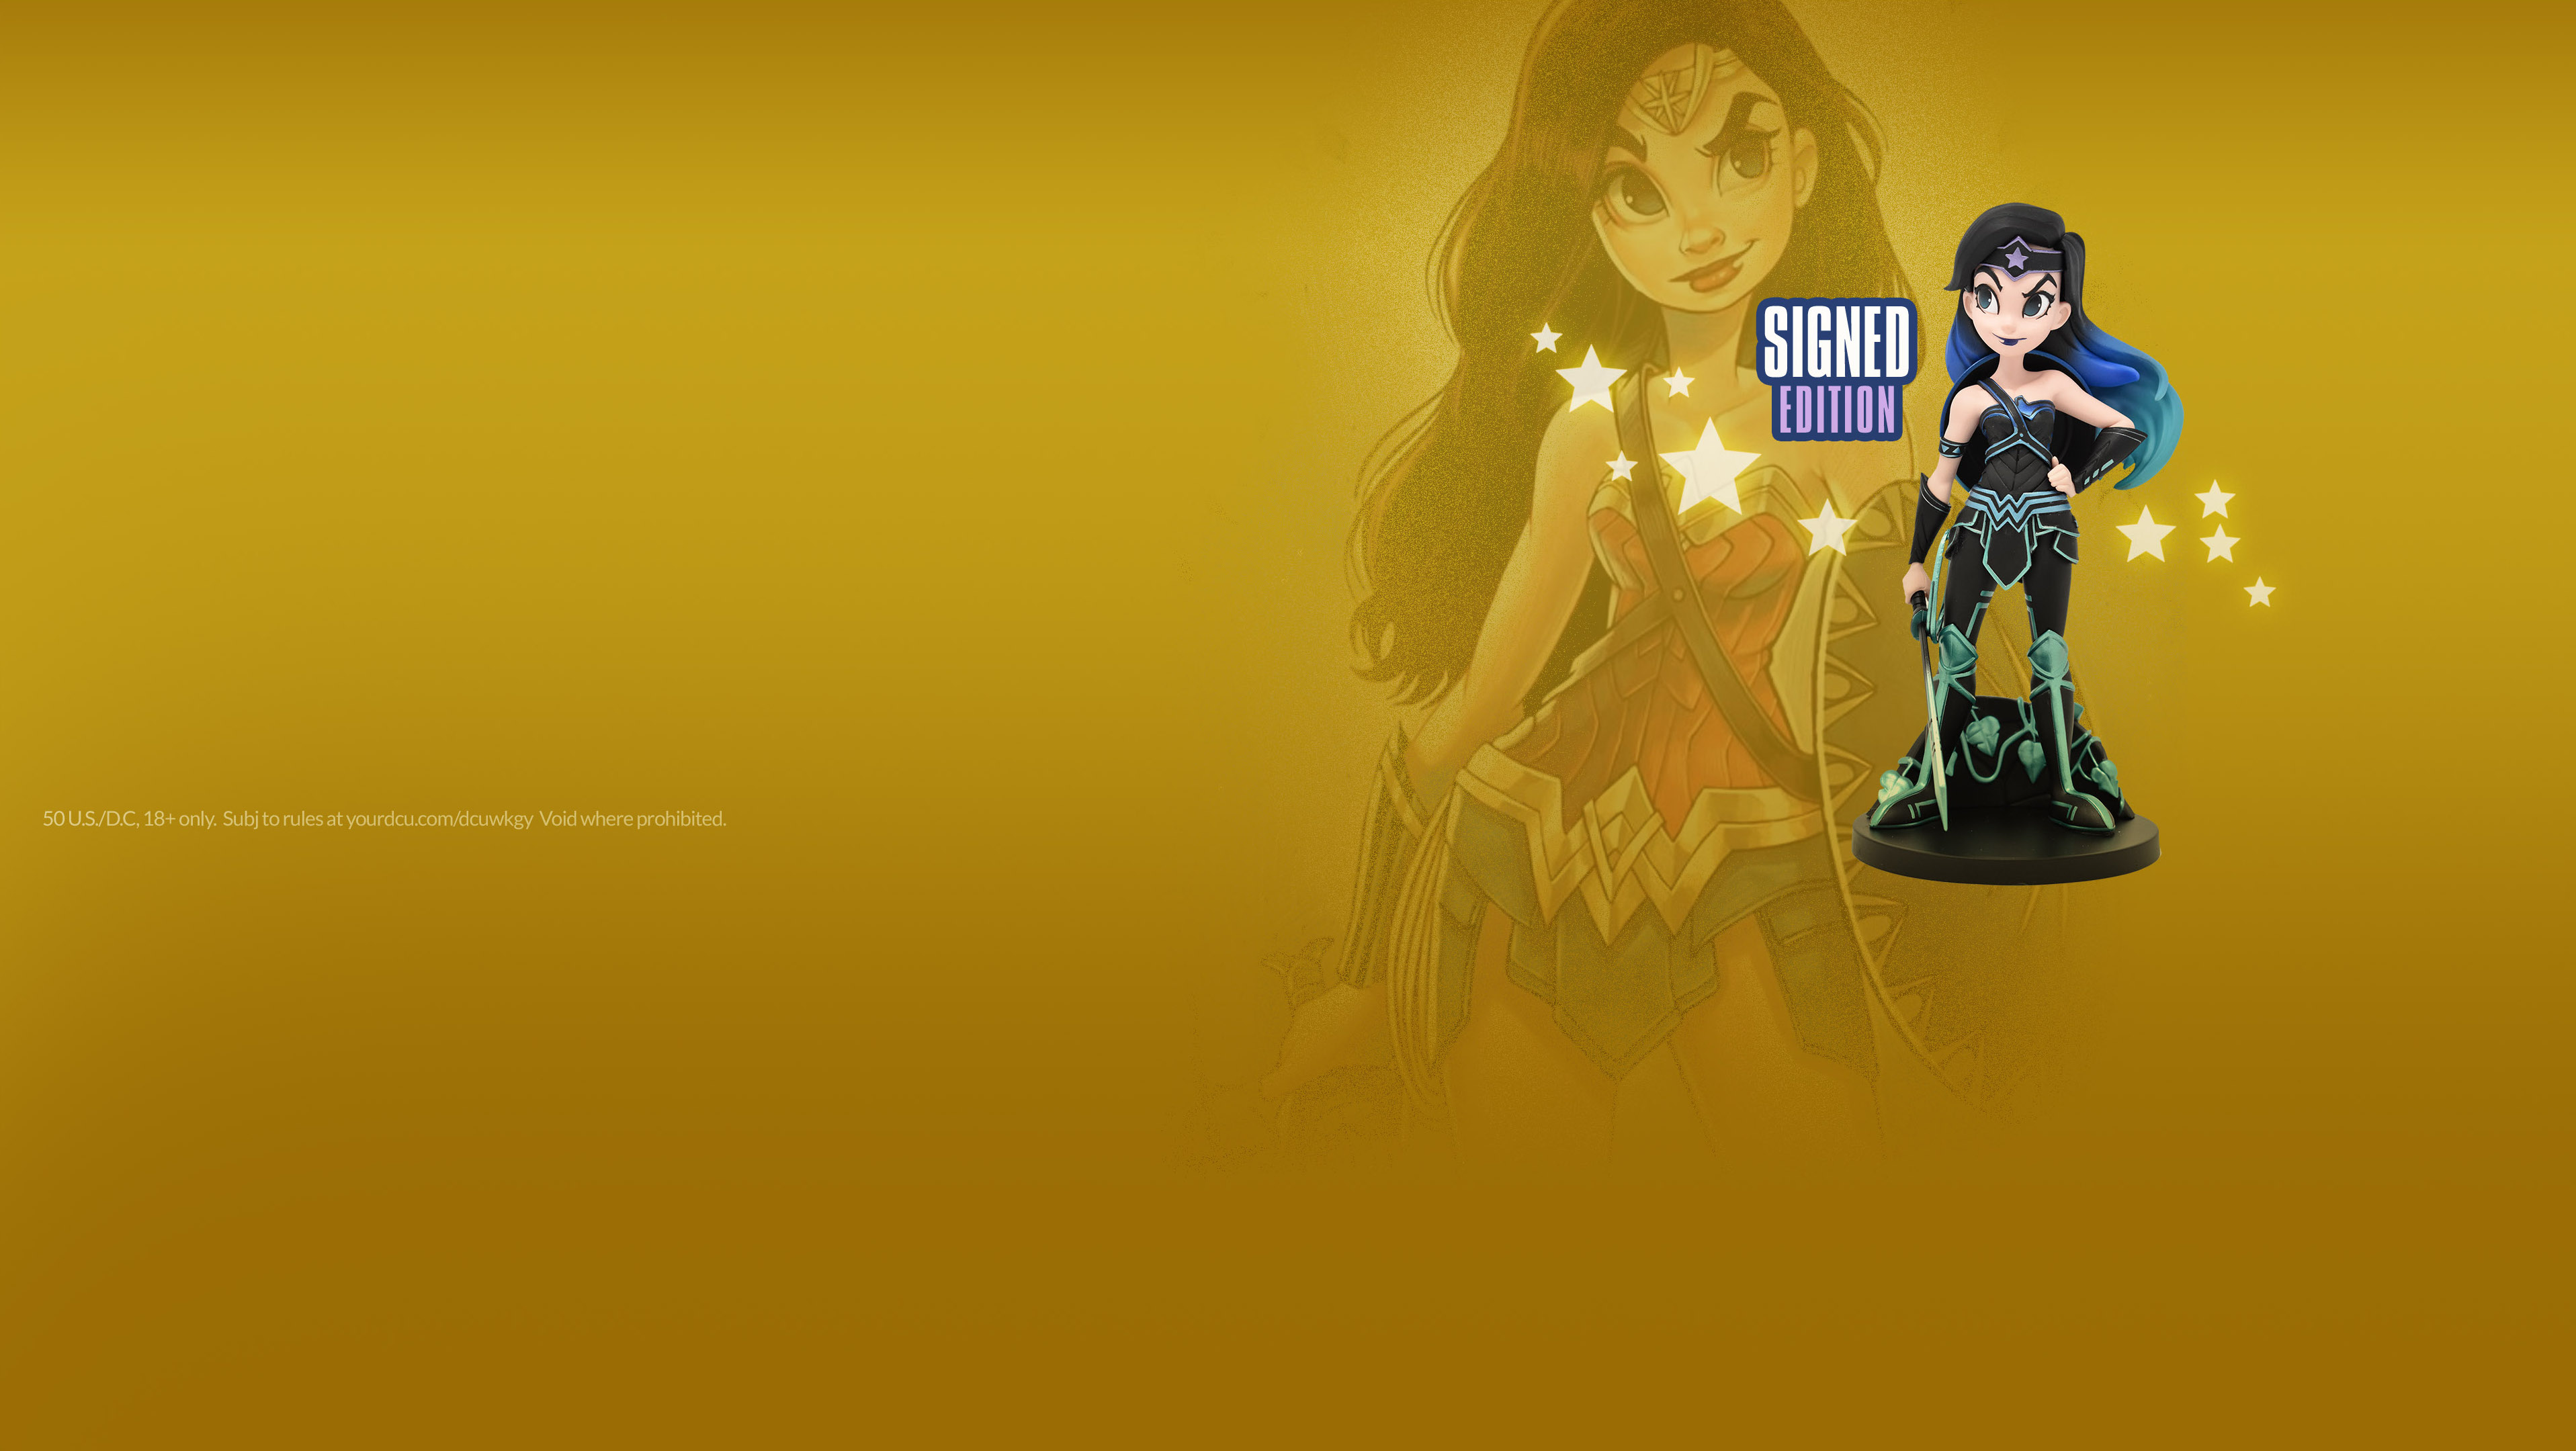 dcu-sweepstakes-dcc_ww_statue_fnl_Single Hero.jpg